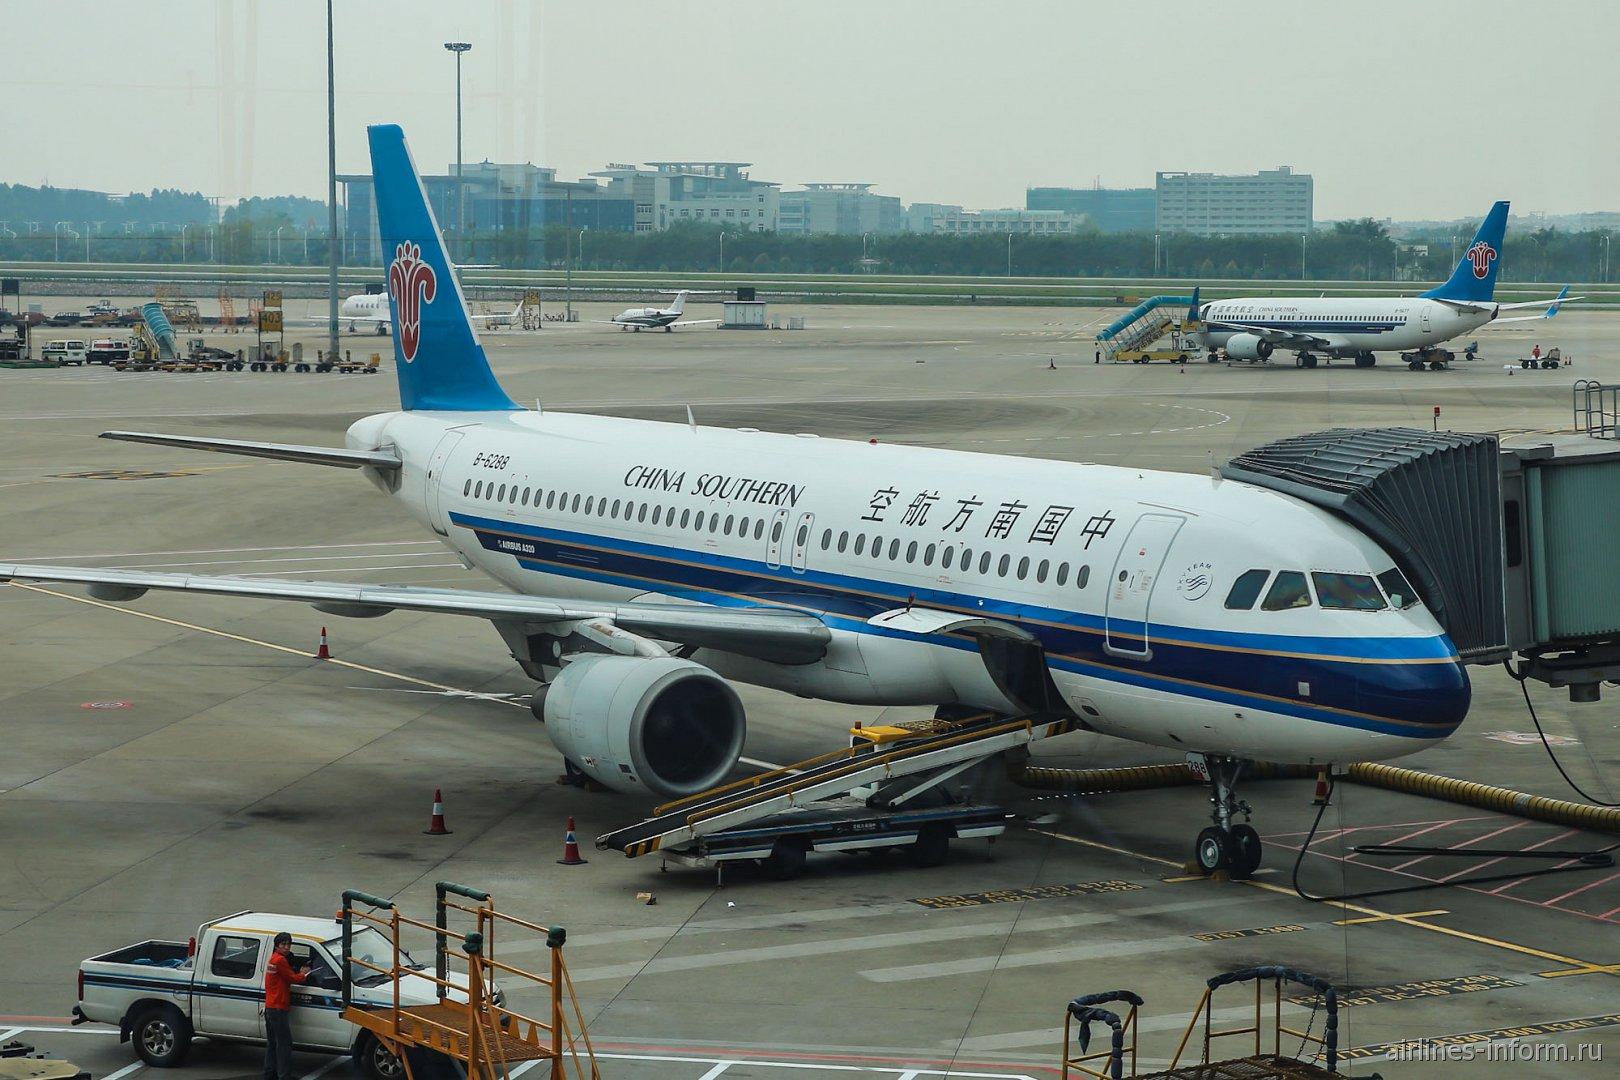 Airbus A320 B-6288 авиакомпании China Southern Airlines в аэропорту Гуанчжоу